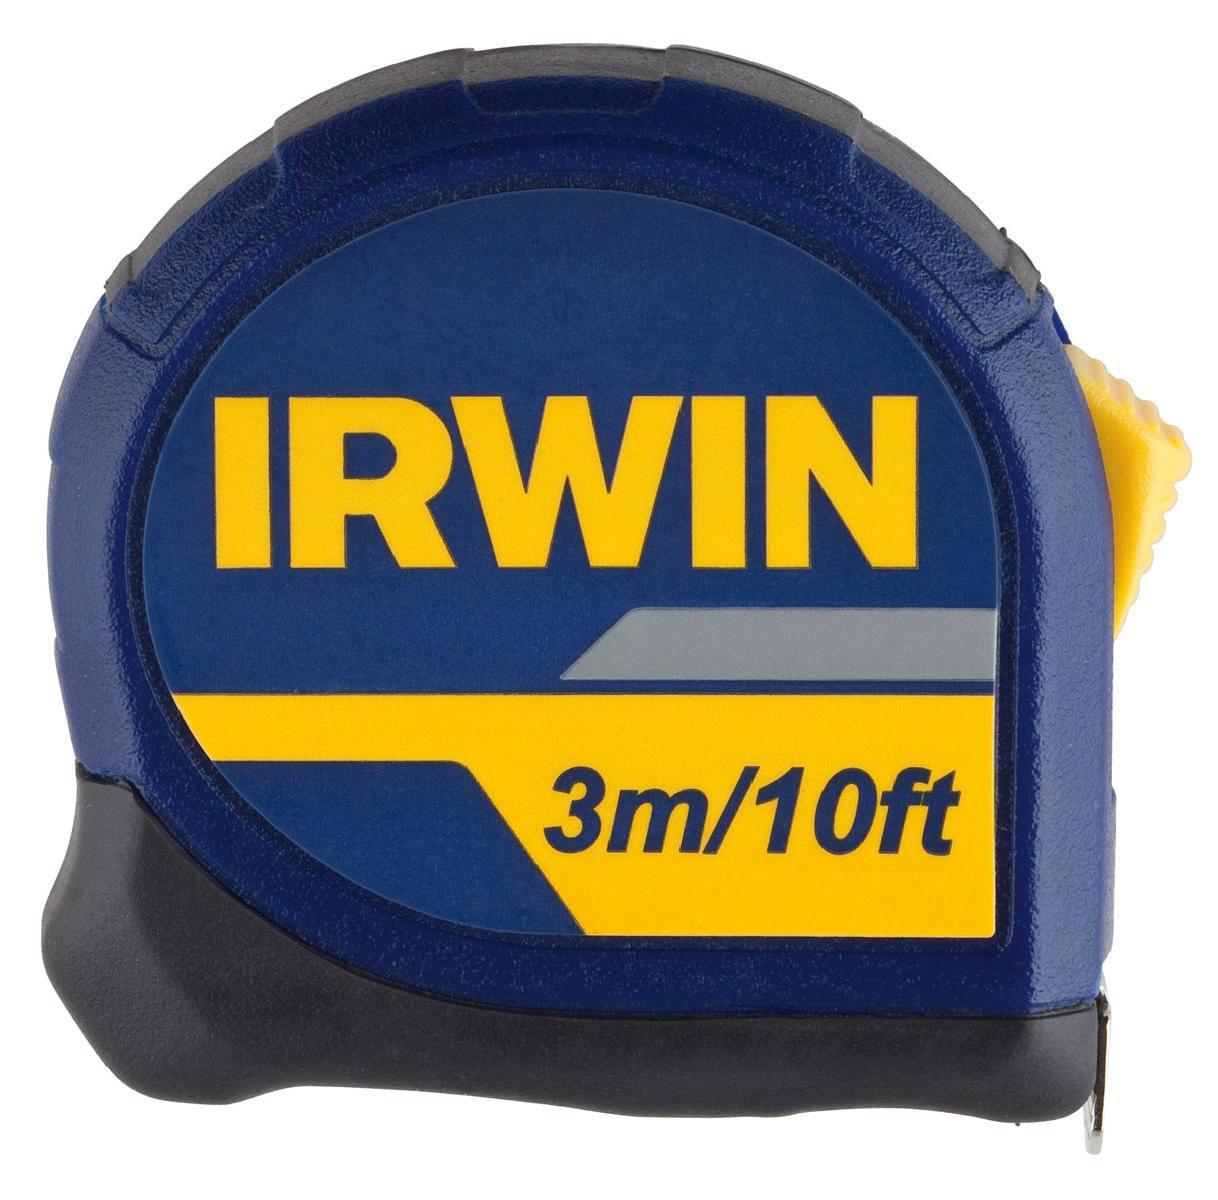 IRWIN 10507787